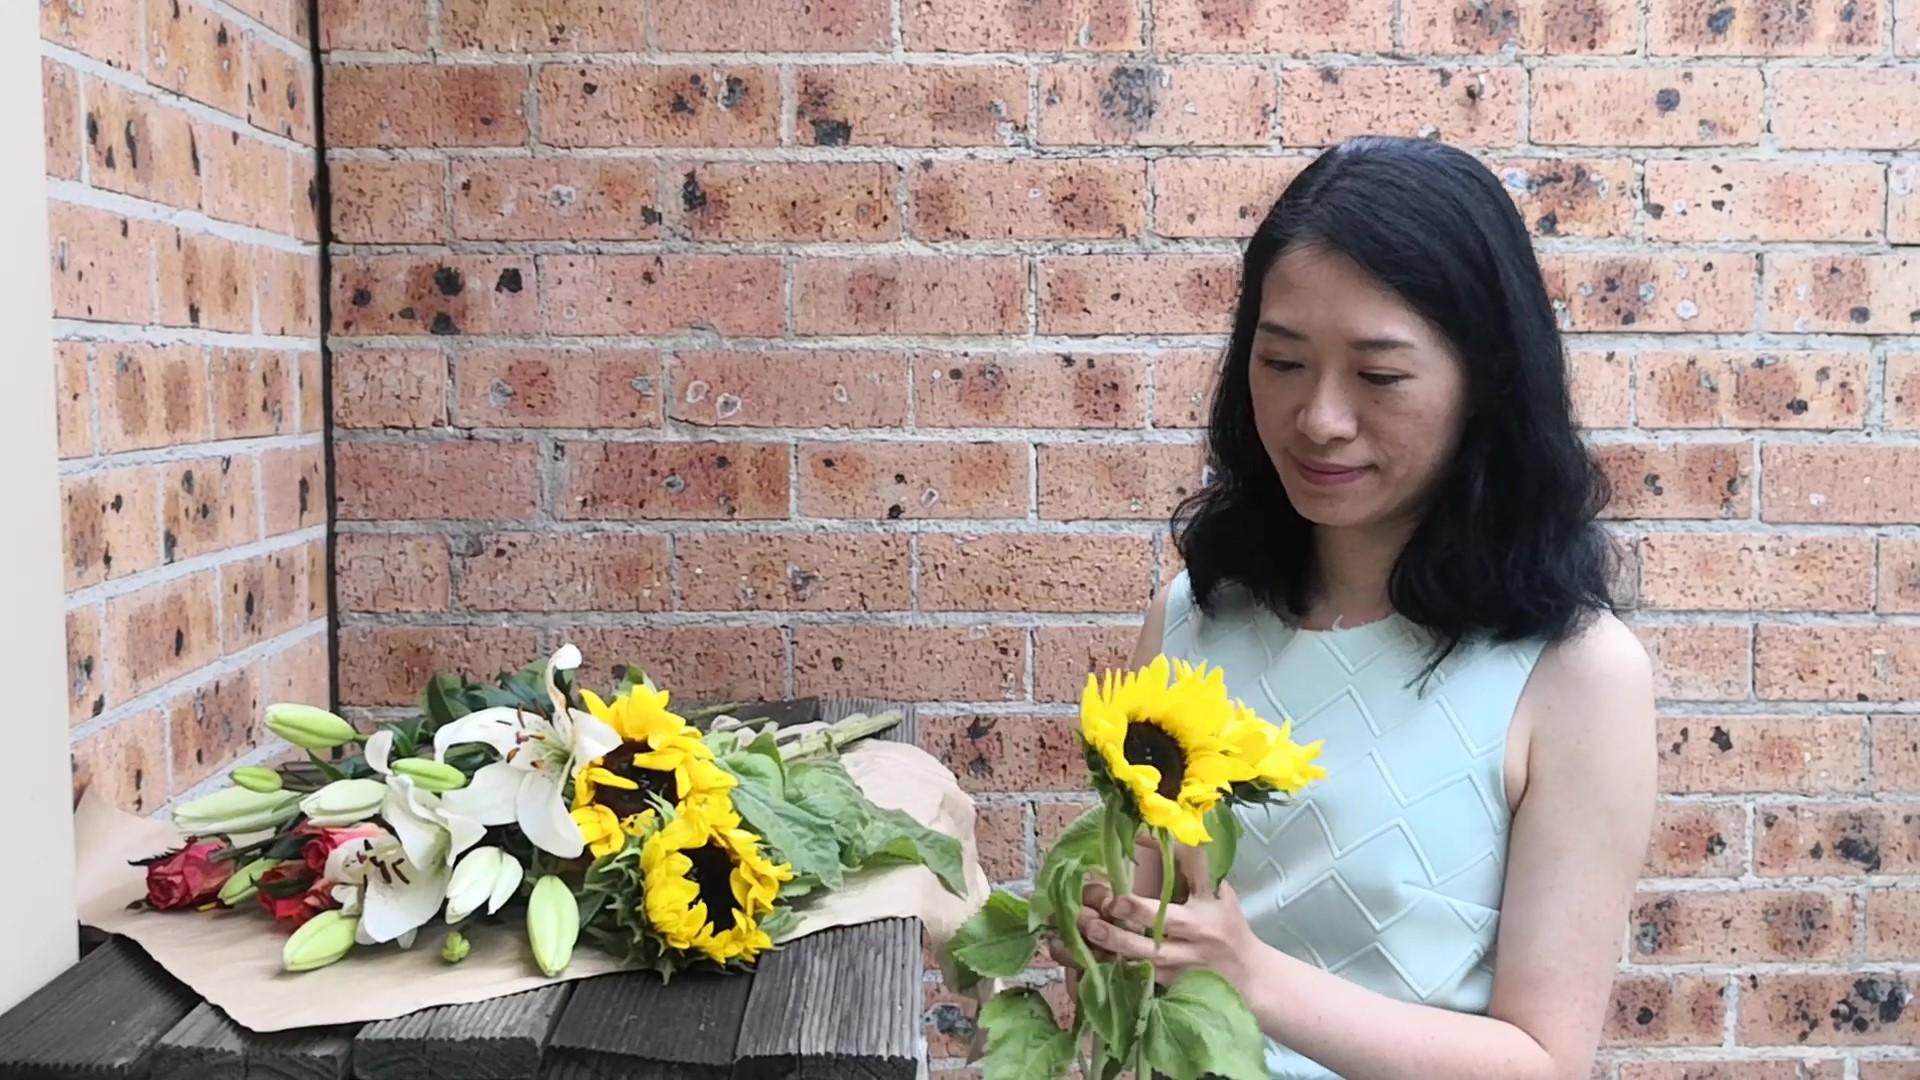 Karin arranging flowers